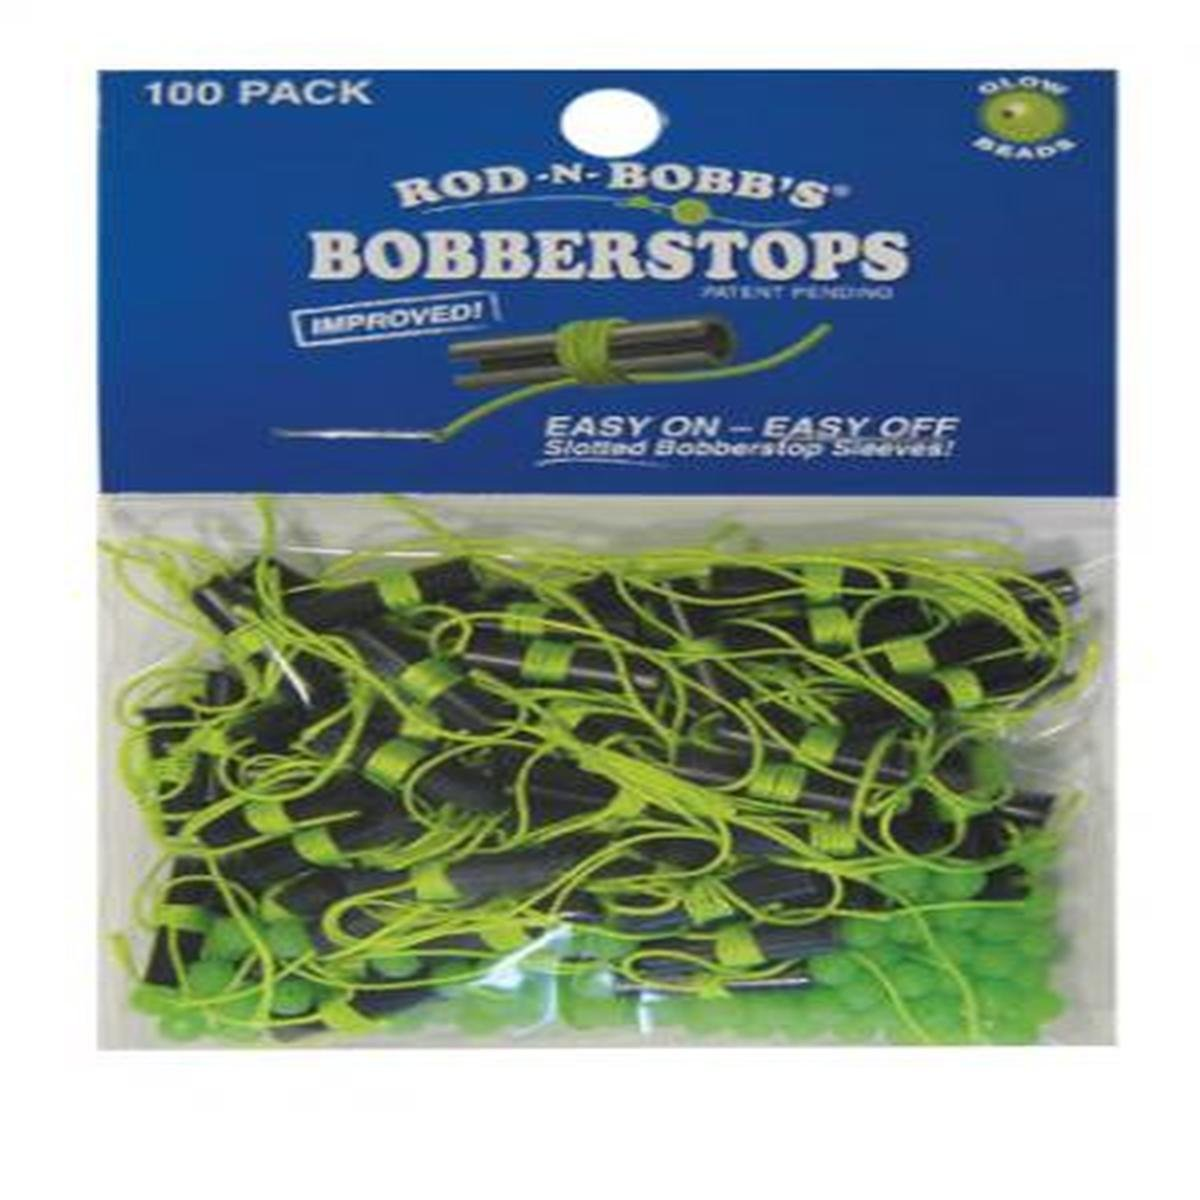 2-Pack Rod-N-BOBBS RXD5 Rex X Bobber